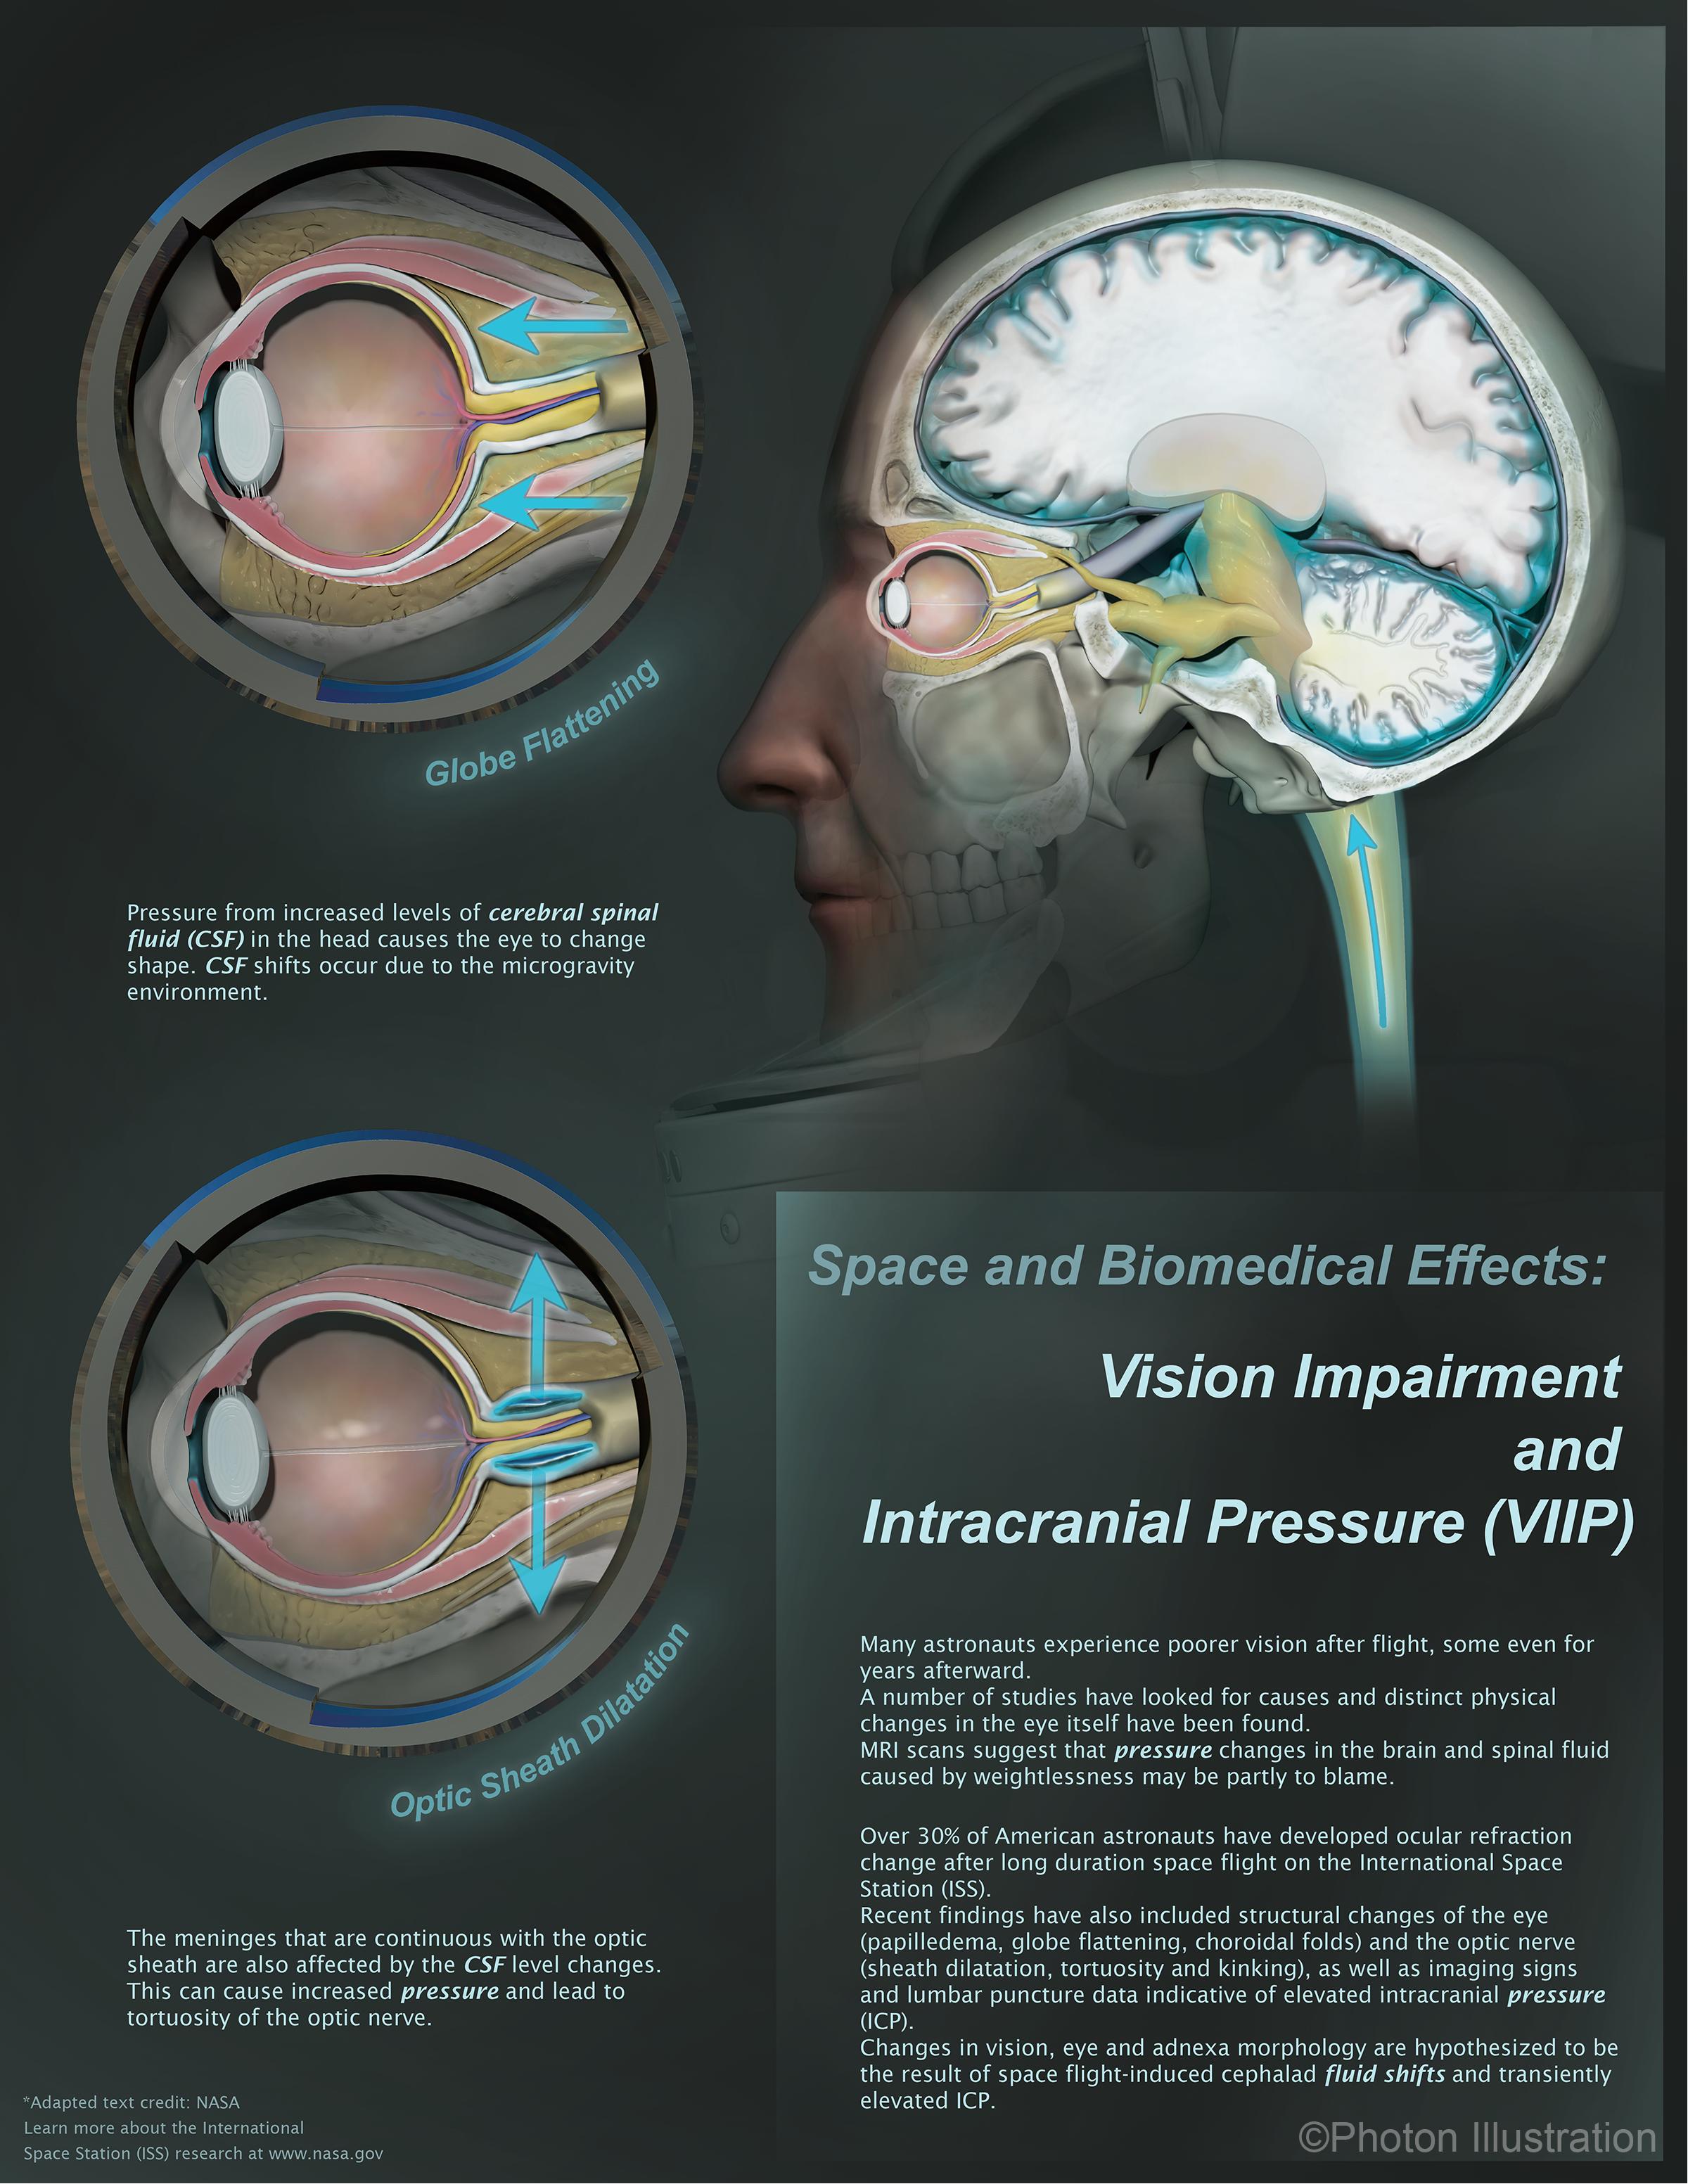 Vision Impairment and Intracranial Pressure